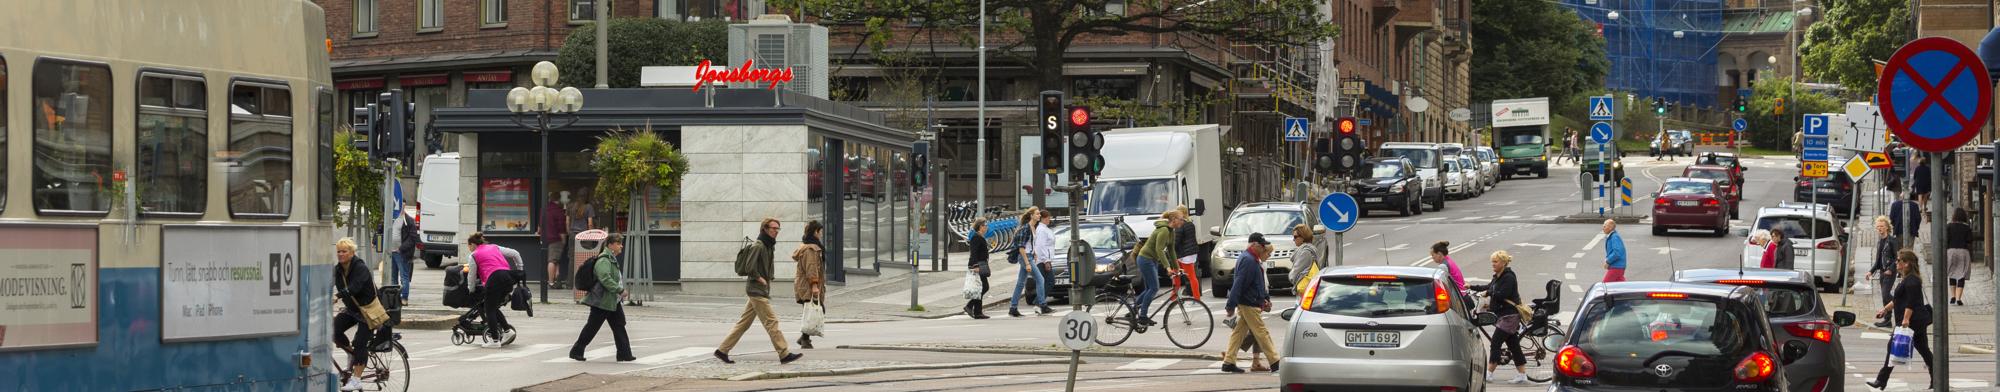 Folk i rörelse på Avenyn framför en kiosk.